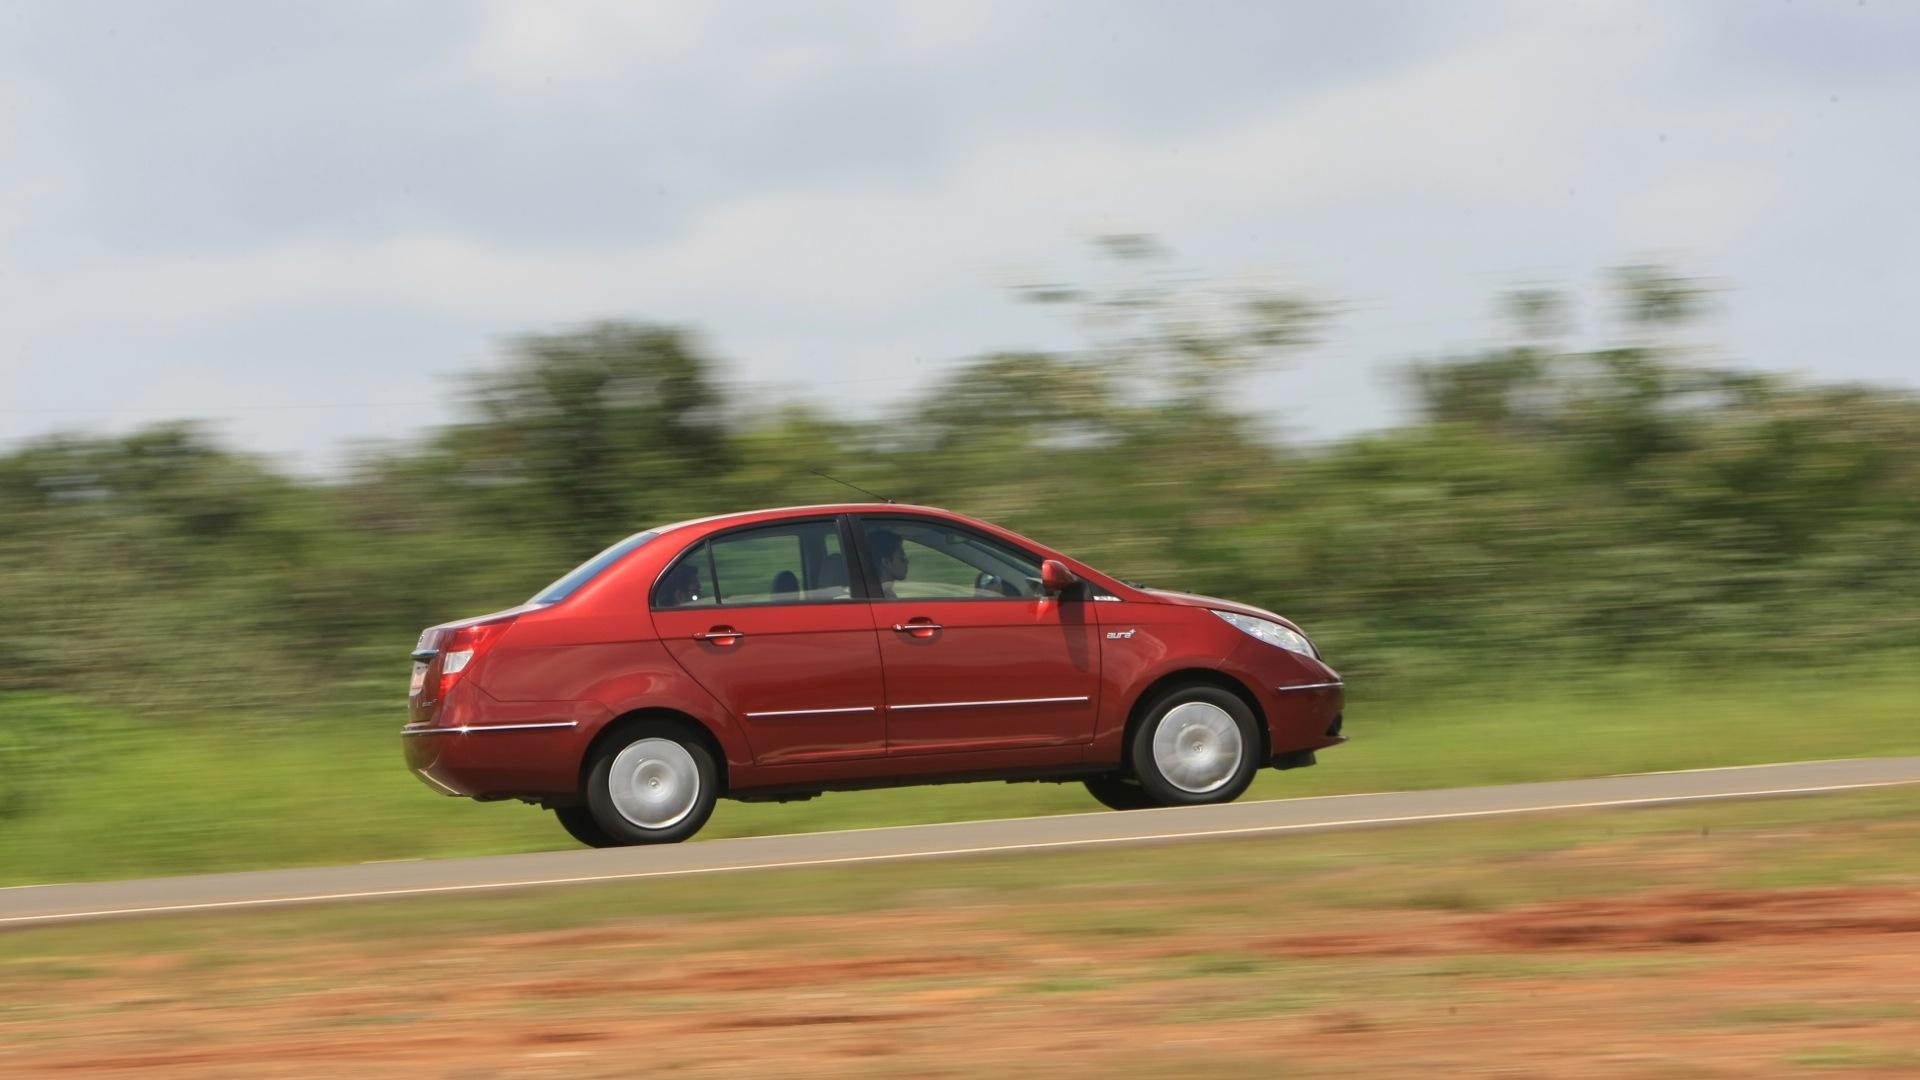 Tata Manza 2013 VX - Price, Mileage, Reviews, Specification